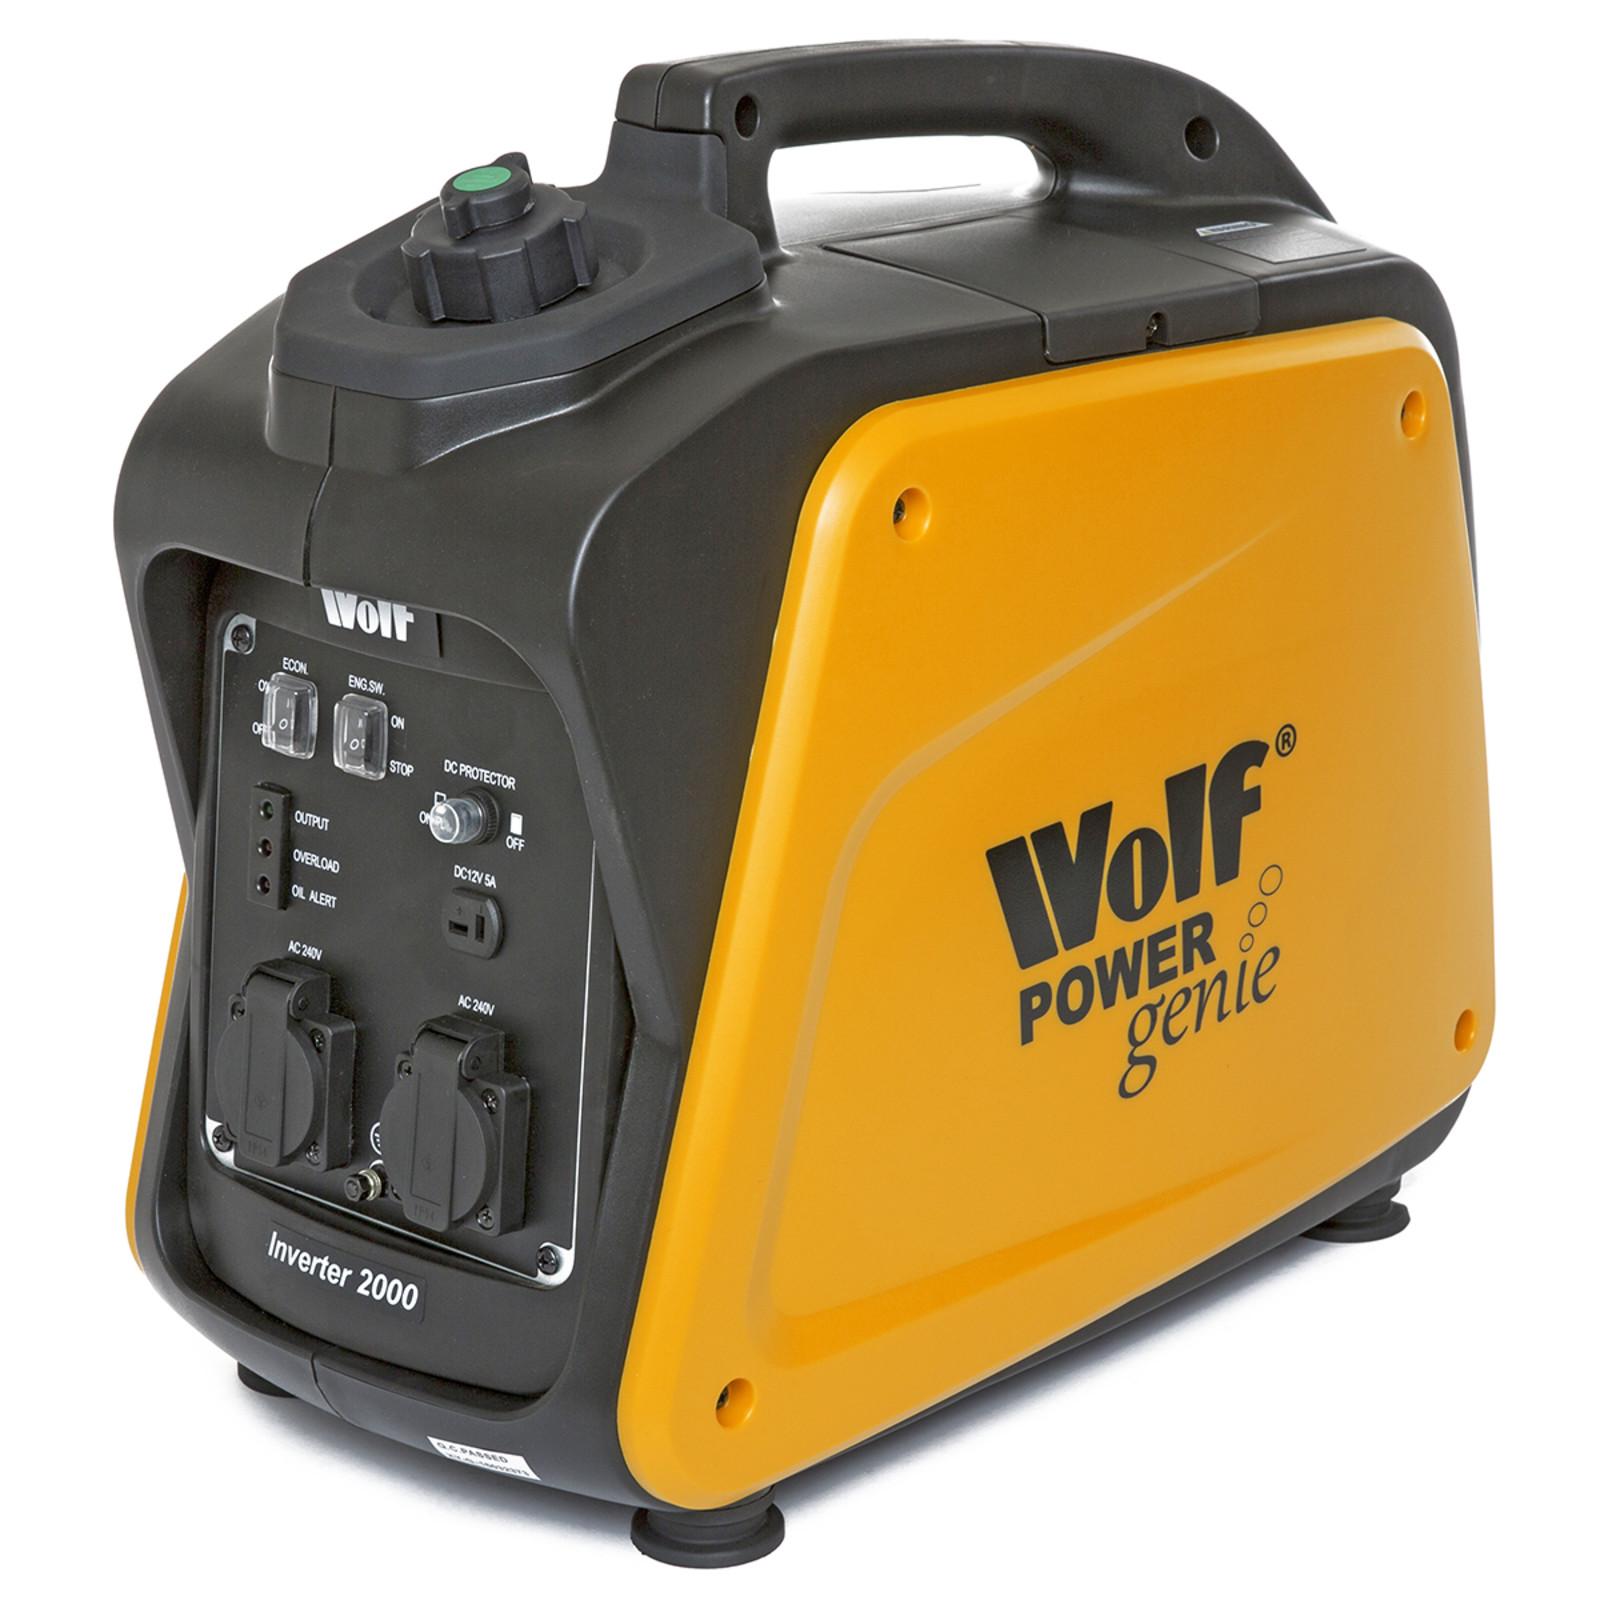 Wolf 2000w Petrol Inverter Generator Power Genie